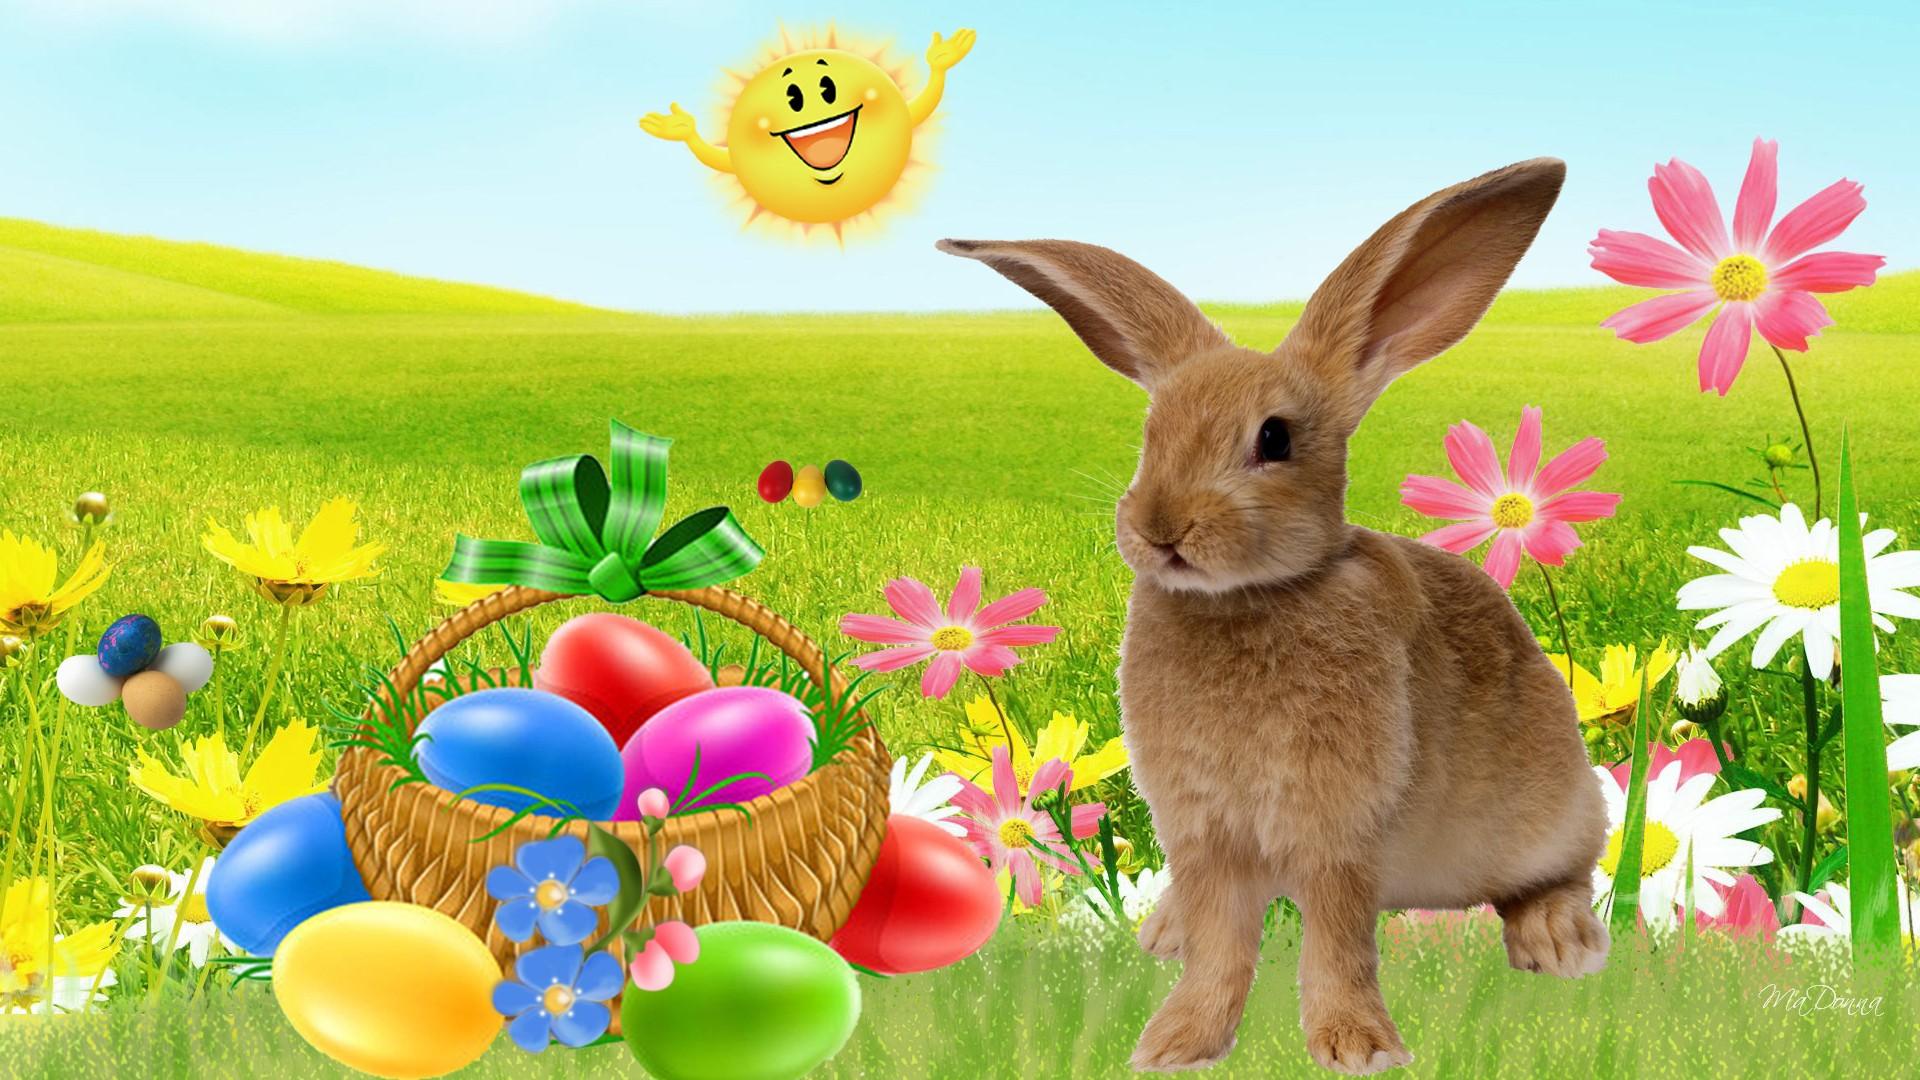 Nechar Wallpaper 3d 35 Happy Easter Desktop Wallpaper Hd For Free